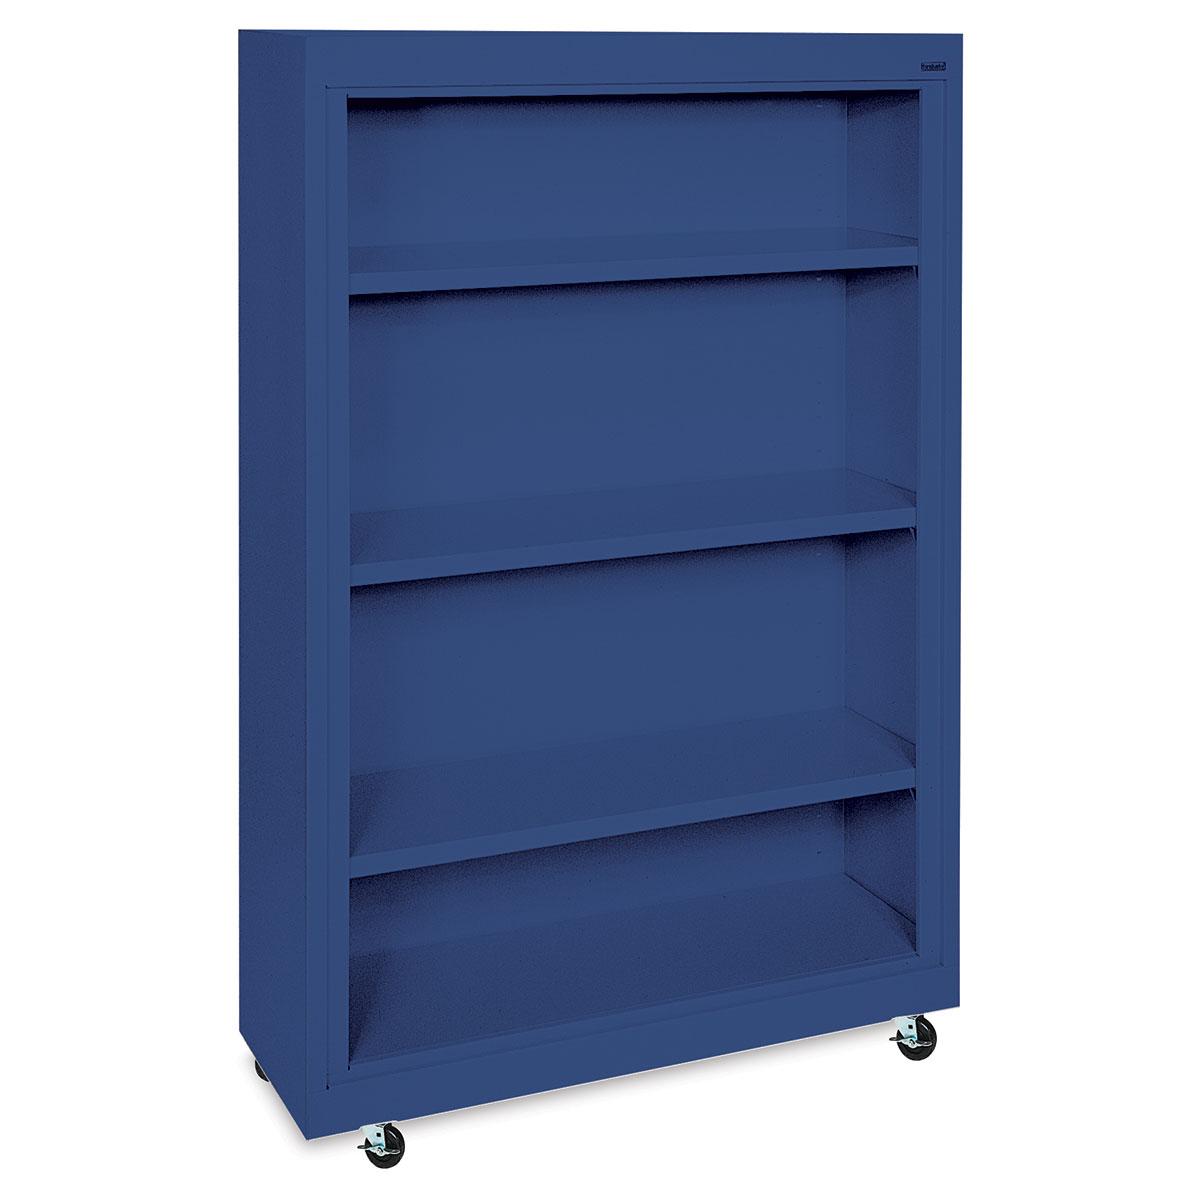 Sandusky Lee Mobile Bookcase - 36 x 58 x 18, Blue